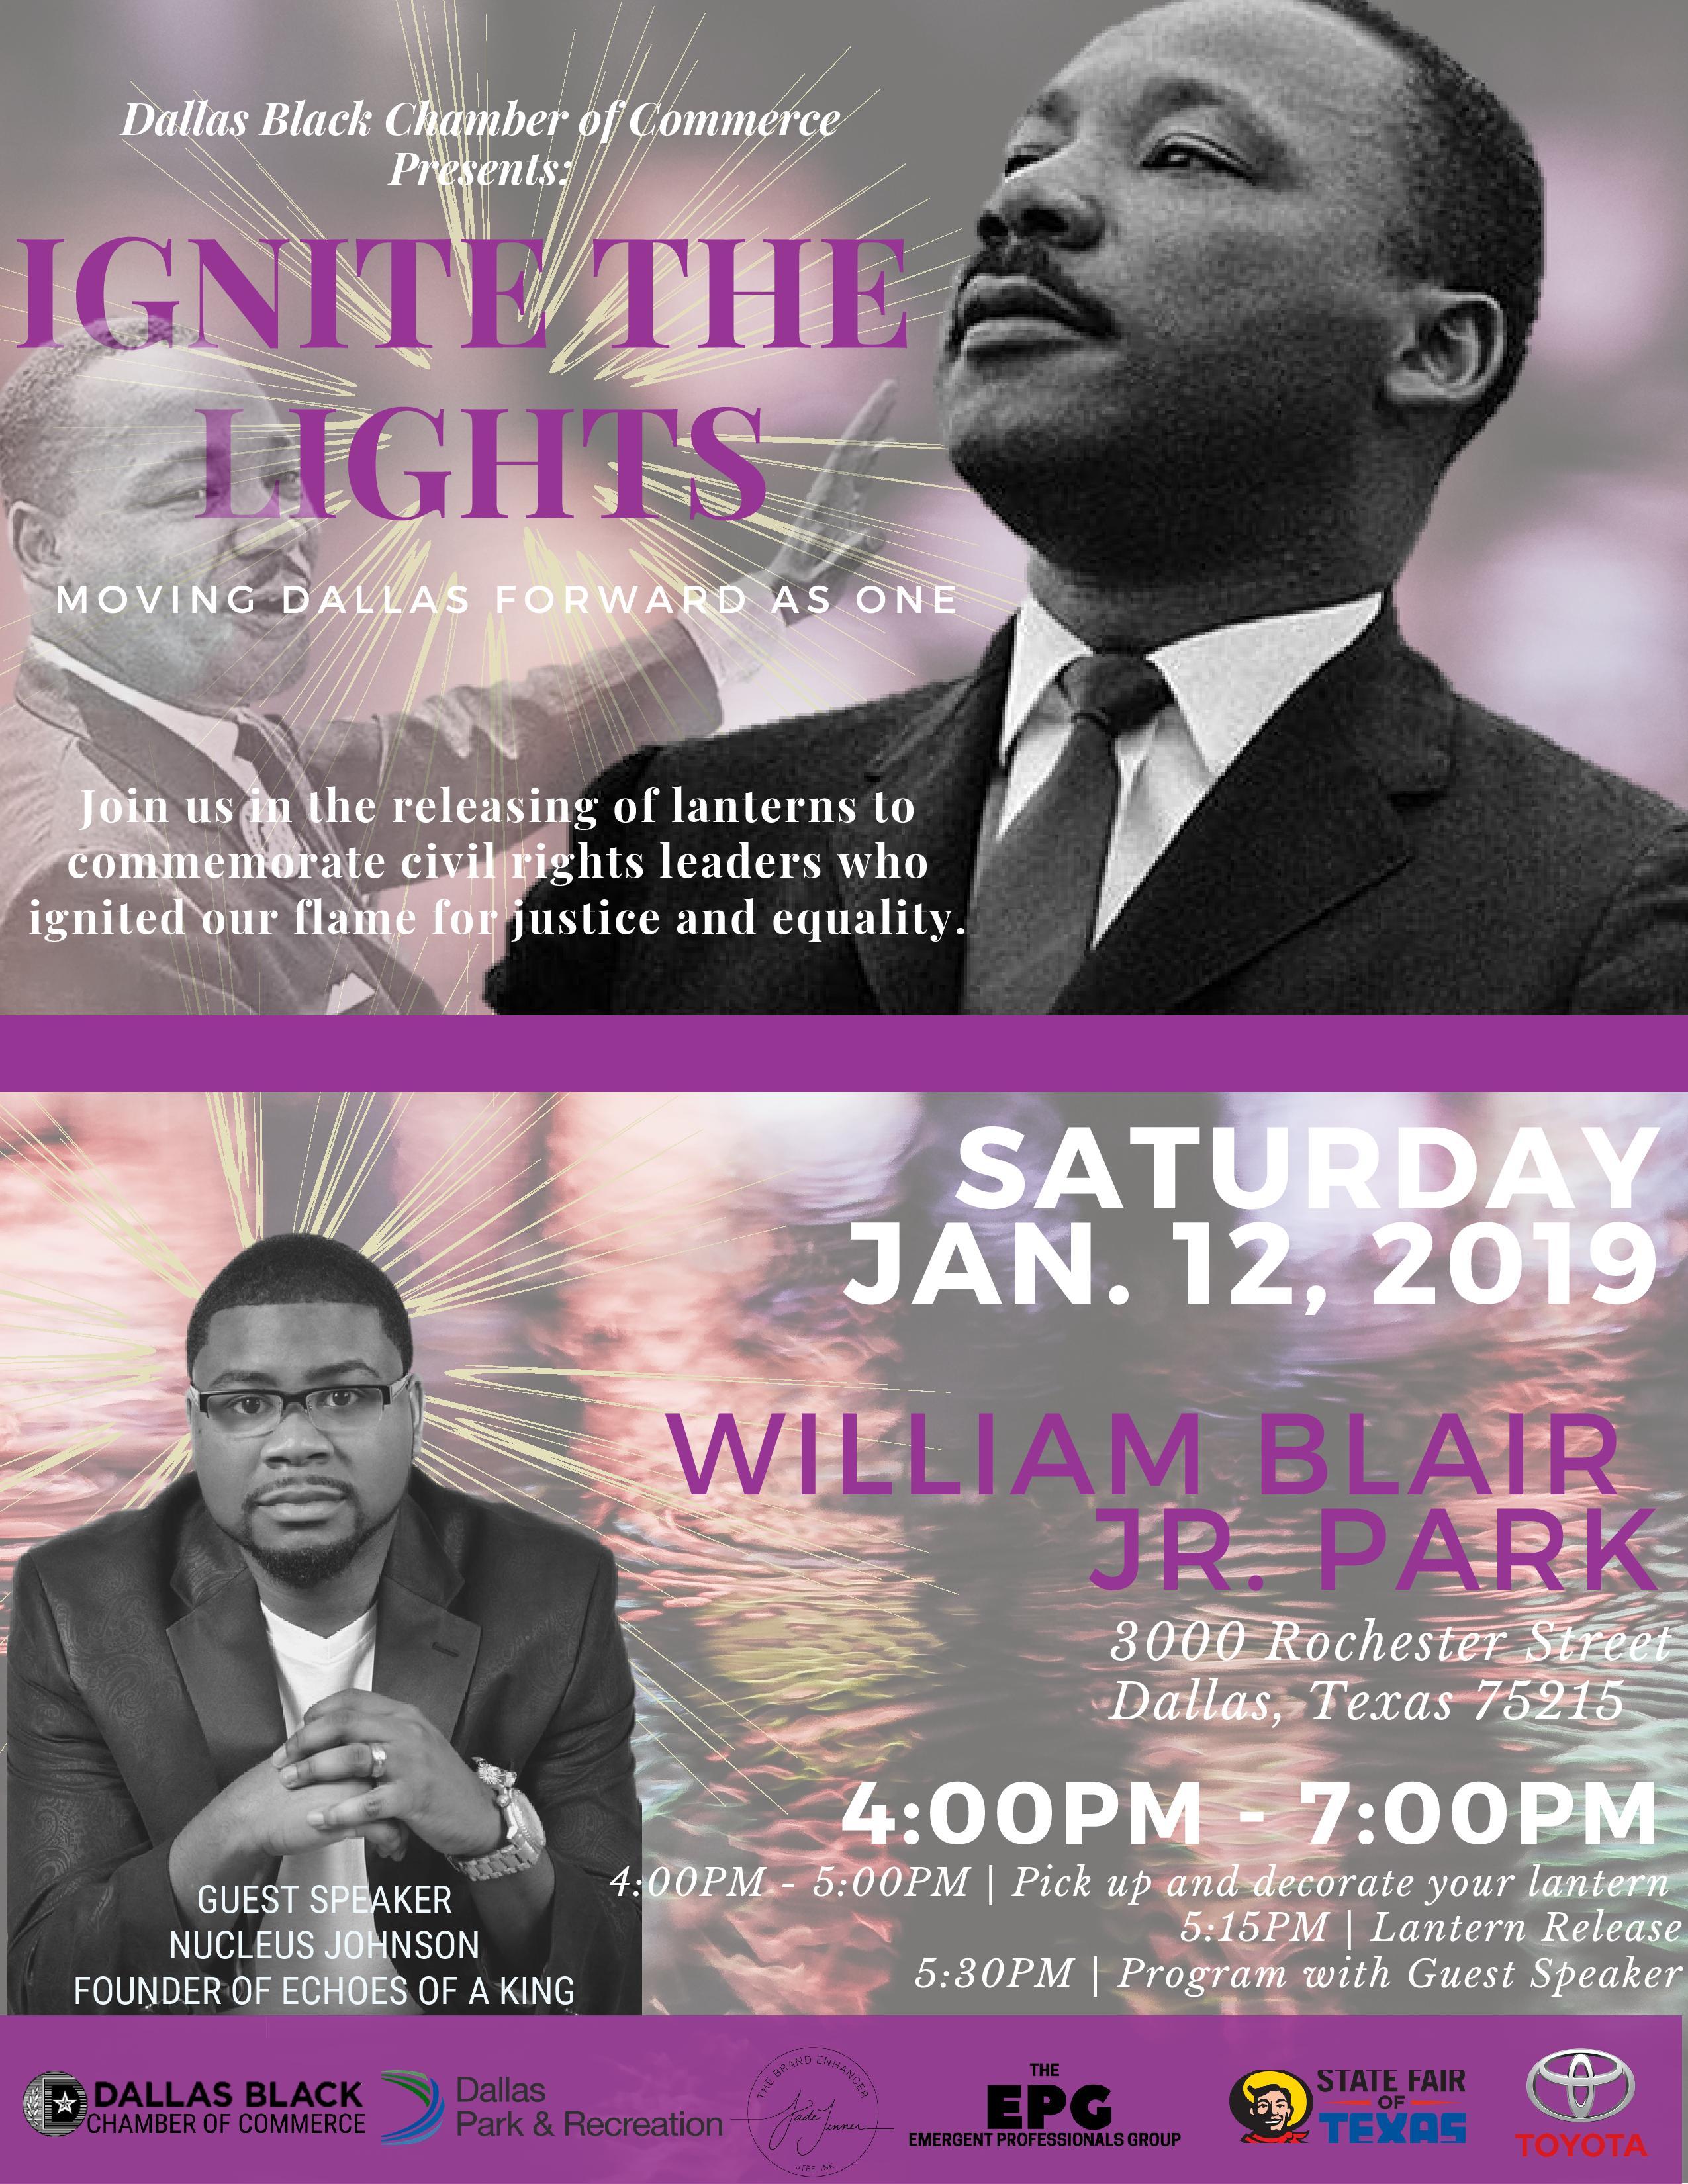 Ignite the Lights at Blair Park @ William Blair Jr. Park